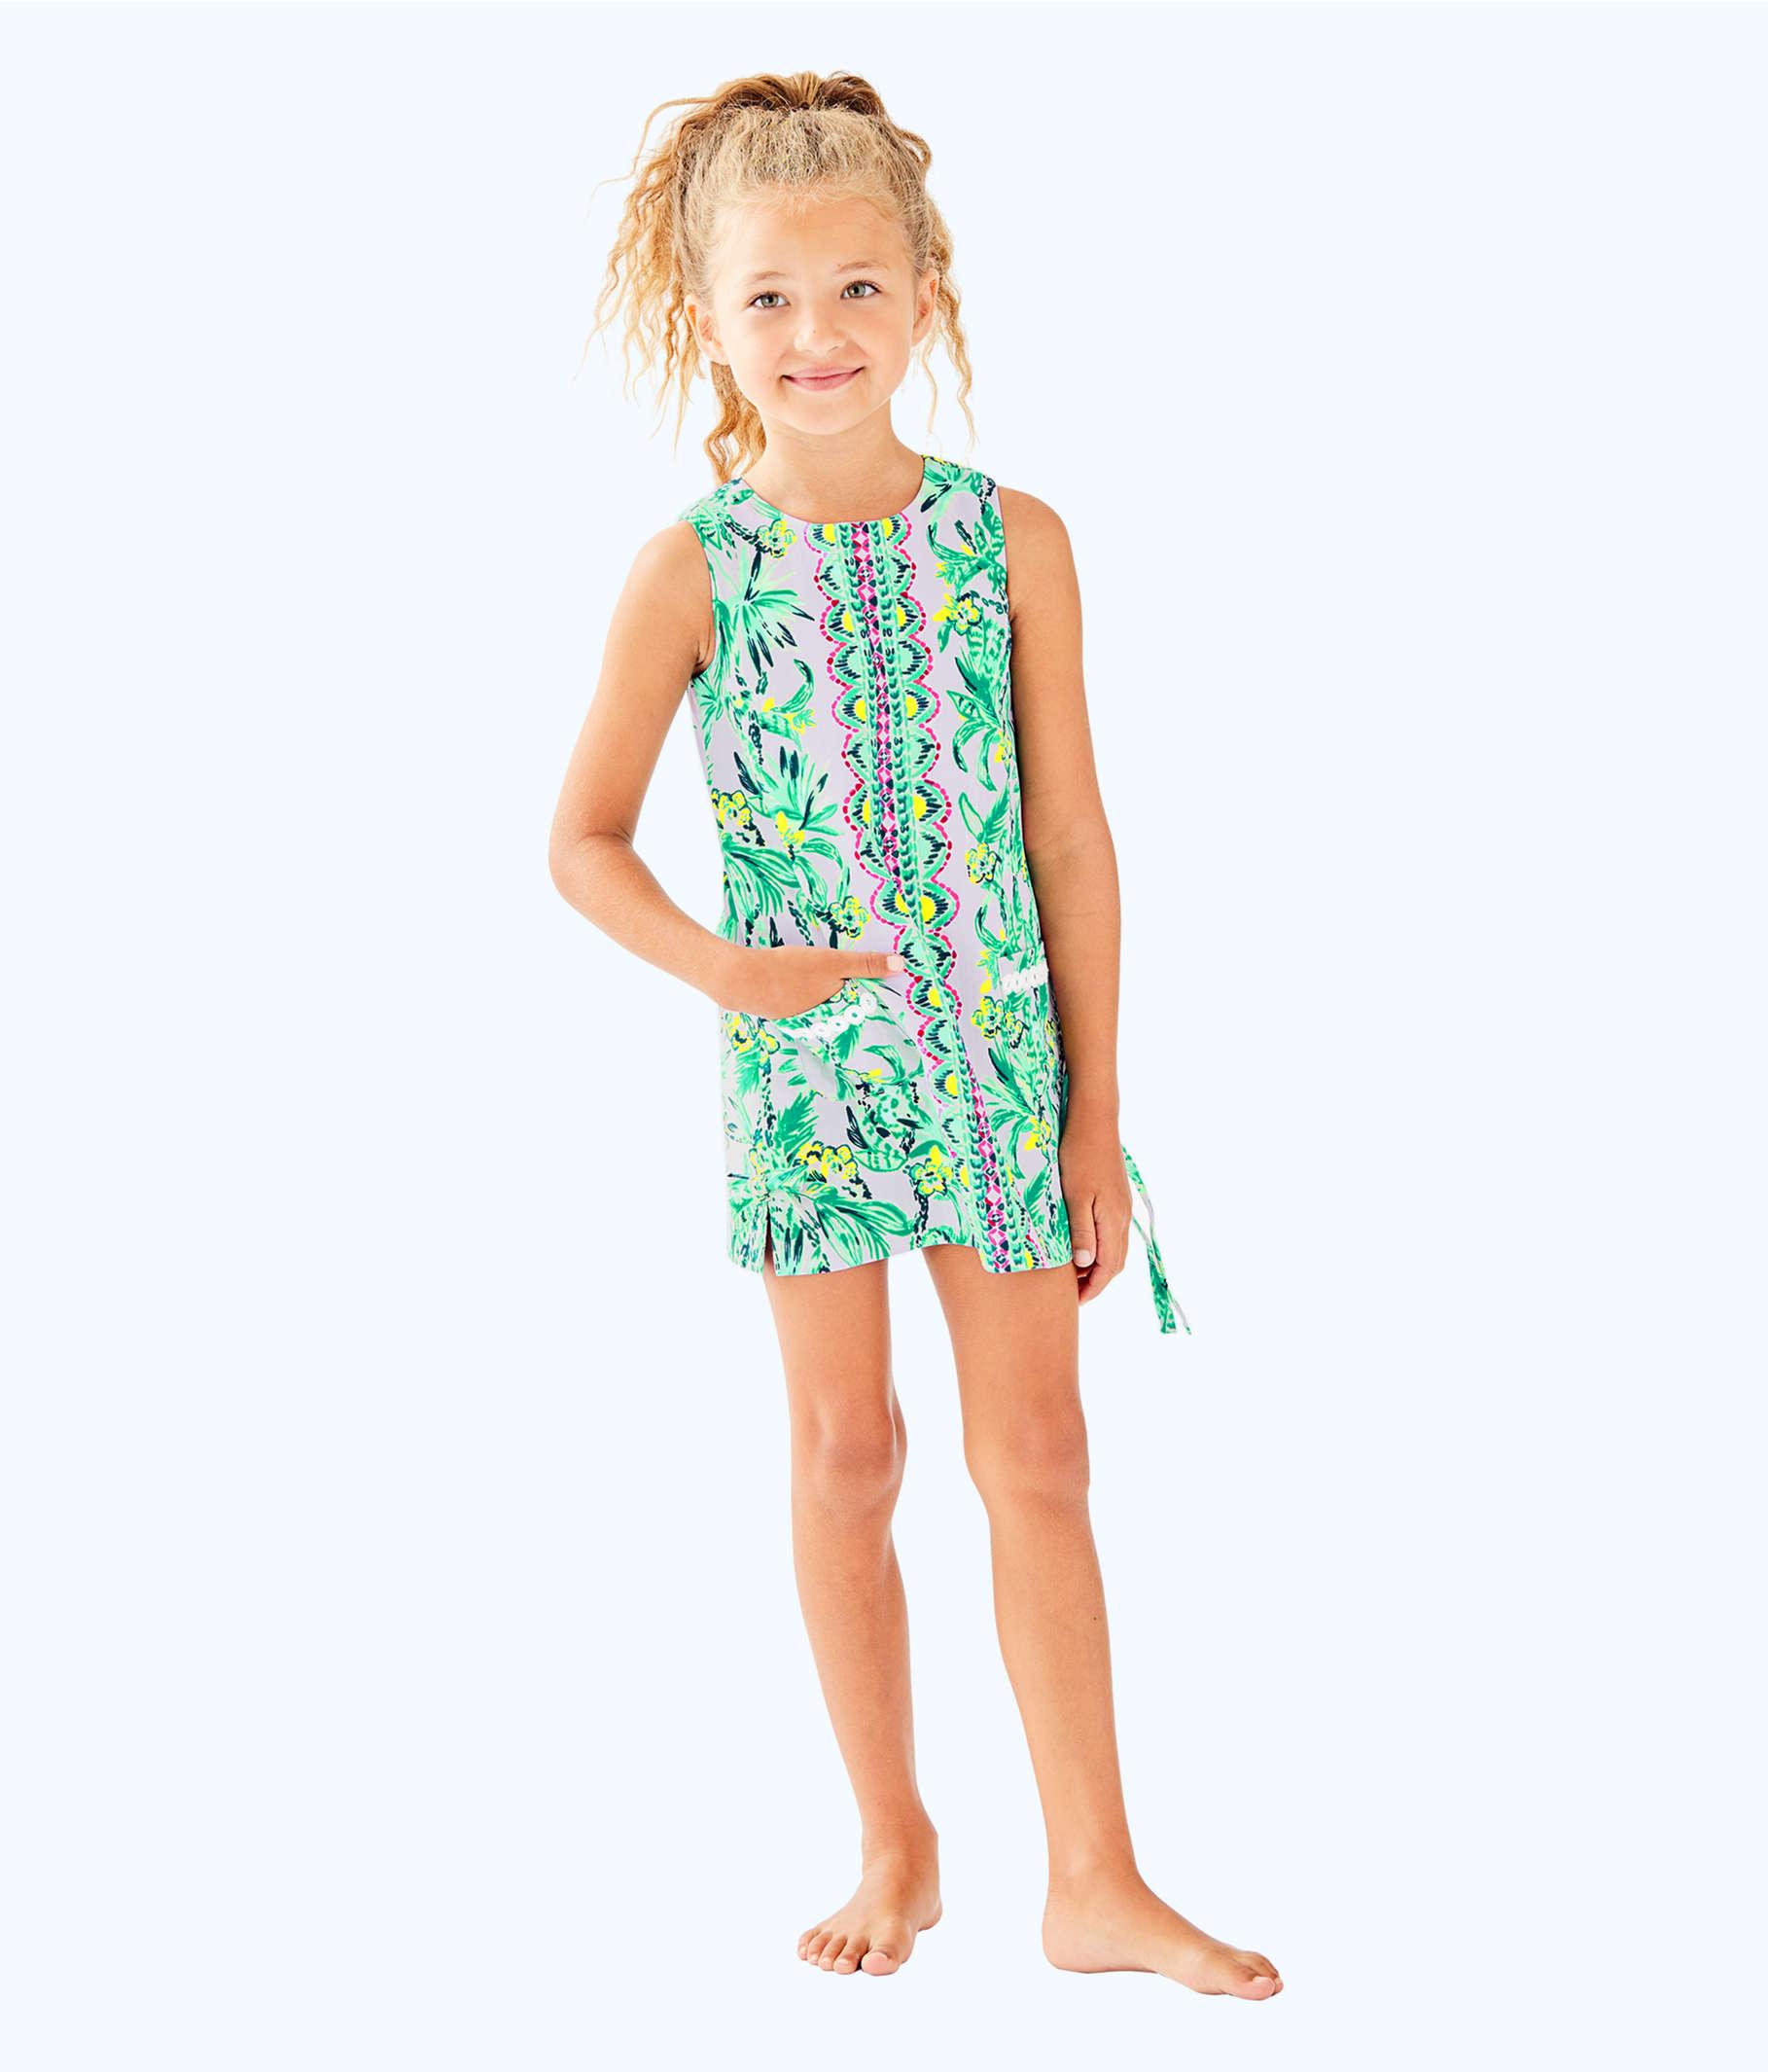 b532a6b5e ... Girls Little Lilly Classic Shift, Light Lilac Verbena Its Impawsible  Eng Kids, large ...